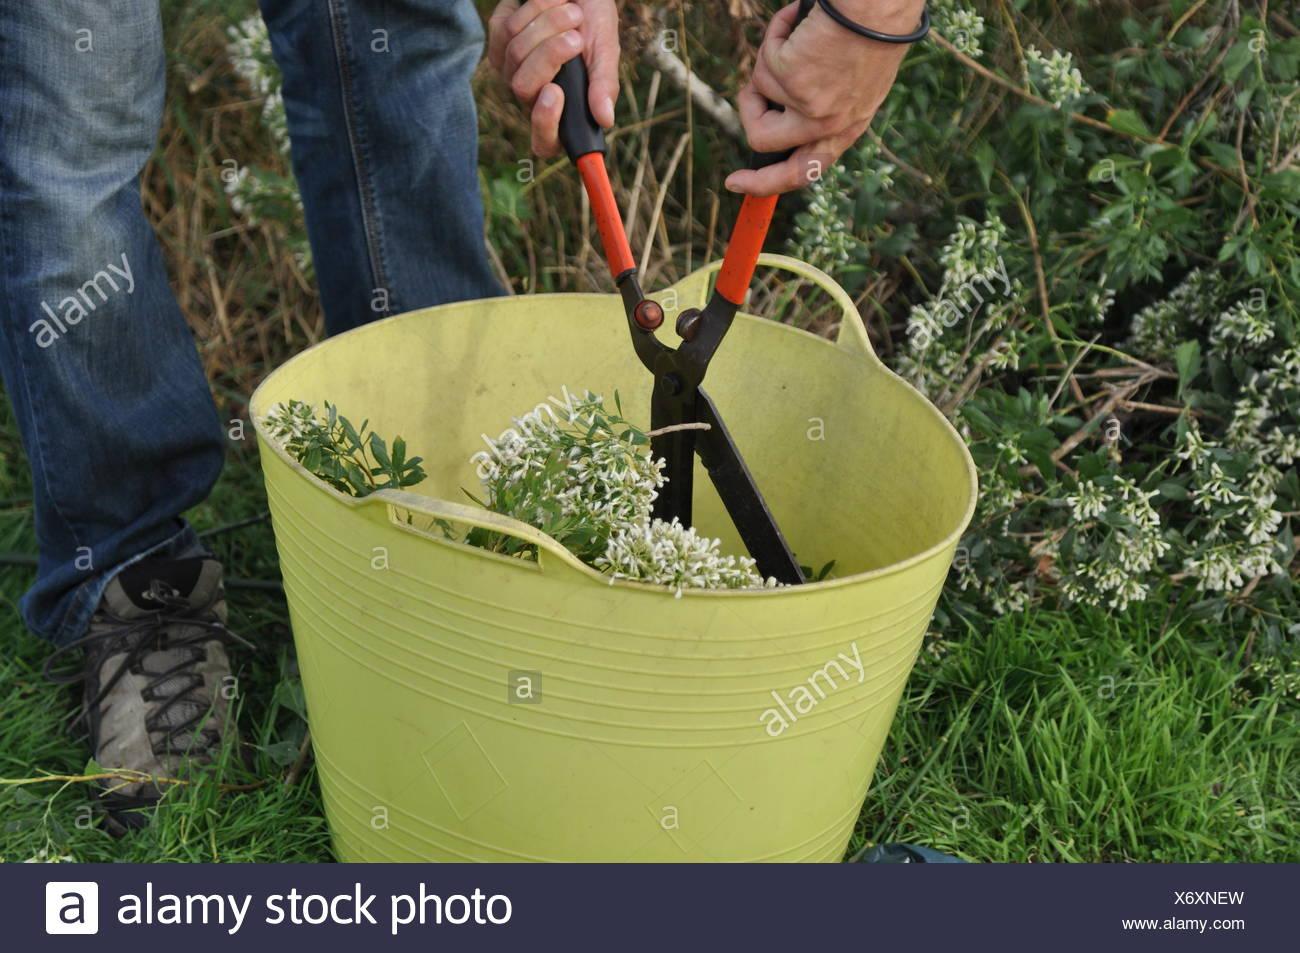 Cutting of groundsel bush inflorescences Stock Photo